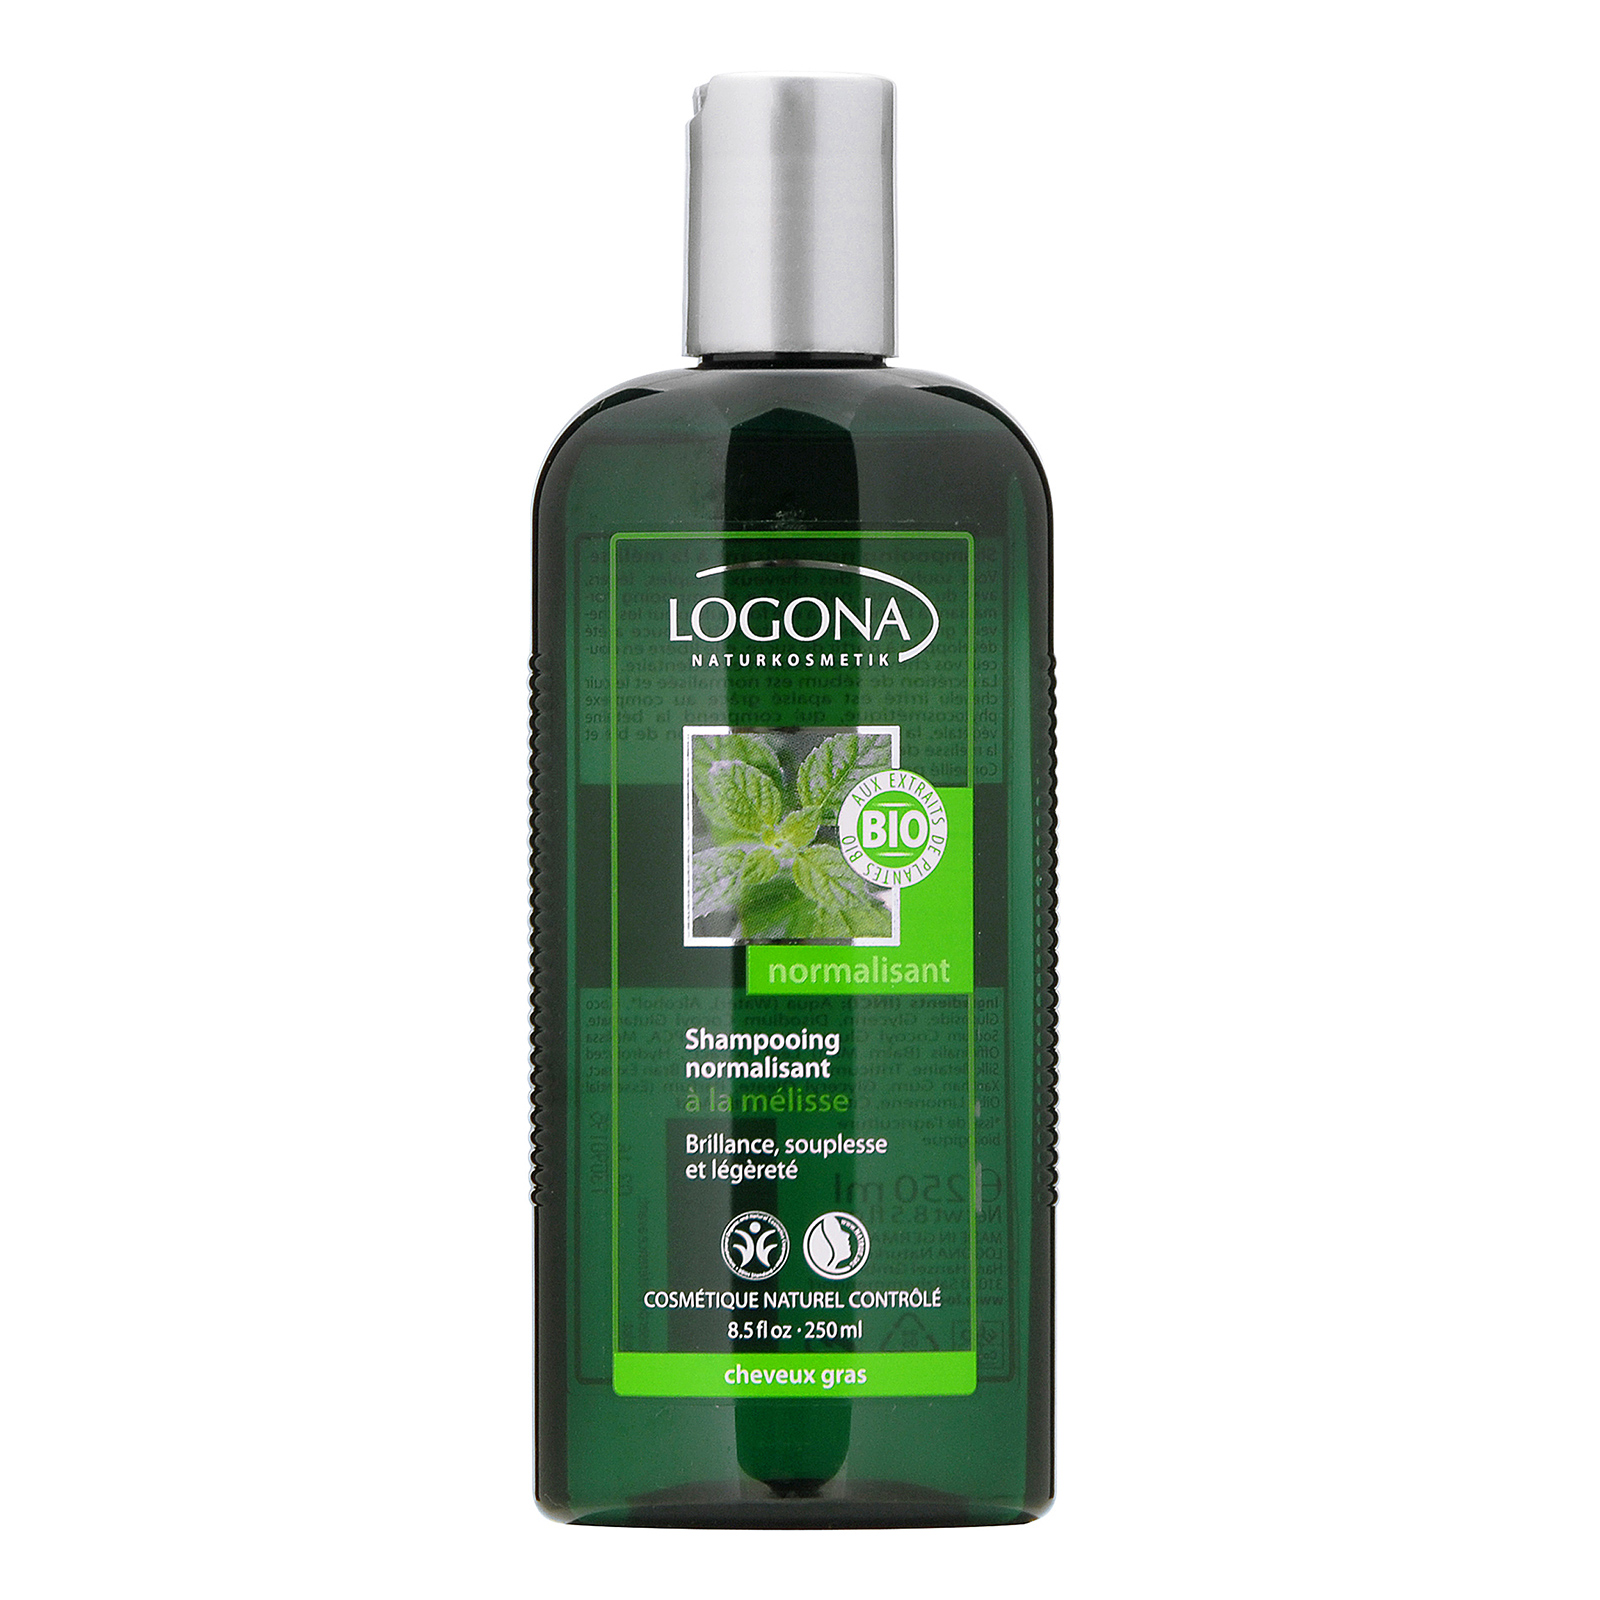 LOGONA  Lemon Balm Balance Shampoo (For Oily Hair & Scalp) 8.5oz, 250ml